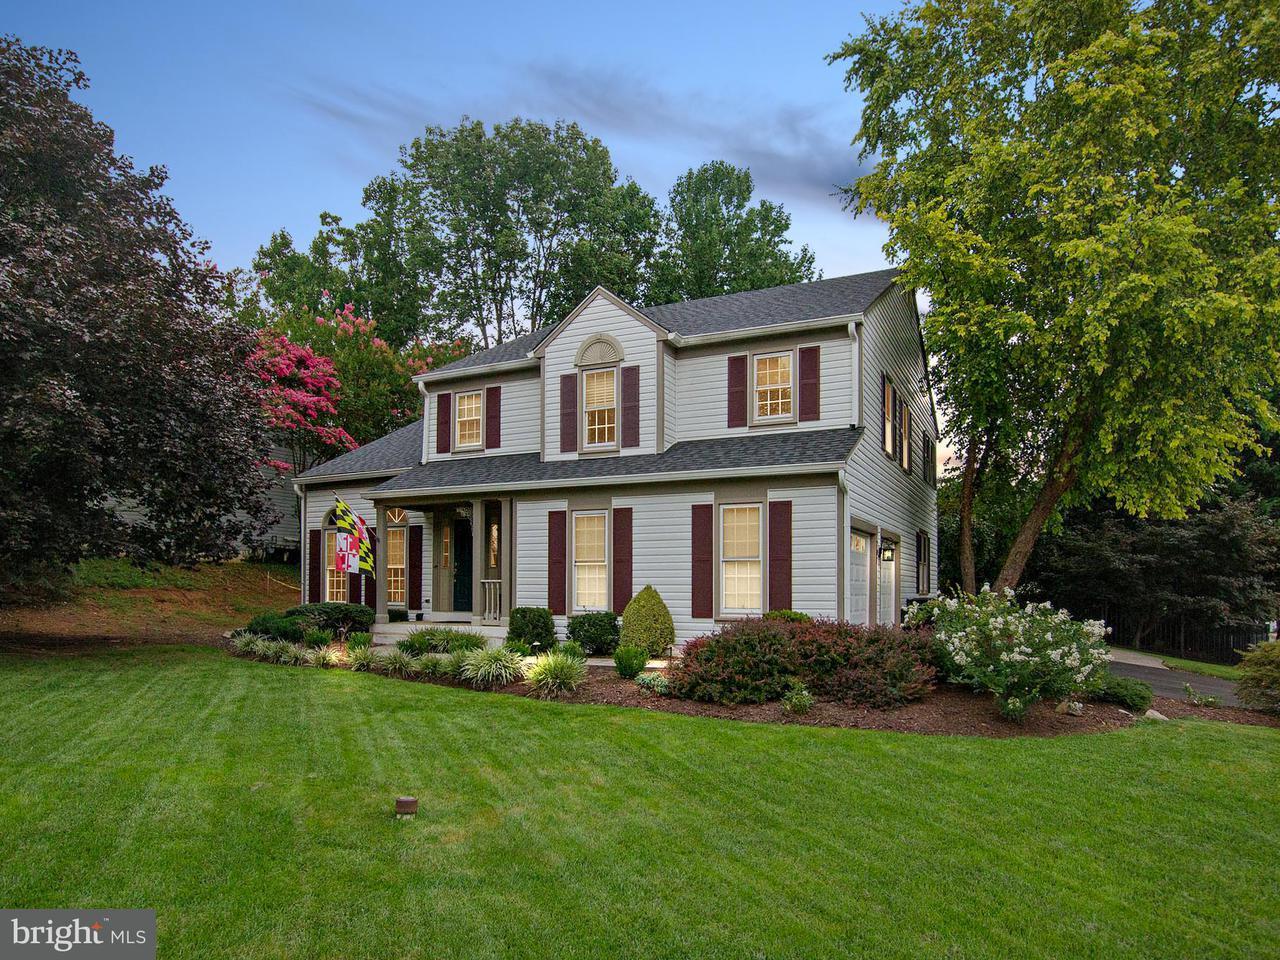 Single Family Home for Sale at 707 WHITE OAKS Avenue 707 WHITE OAKS Avenue Baltimore, Maryland 21228 United States